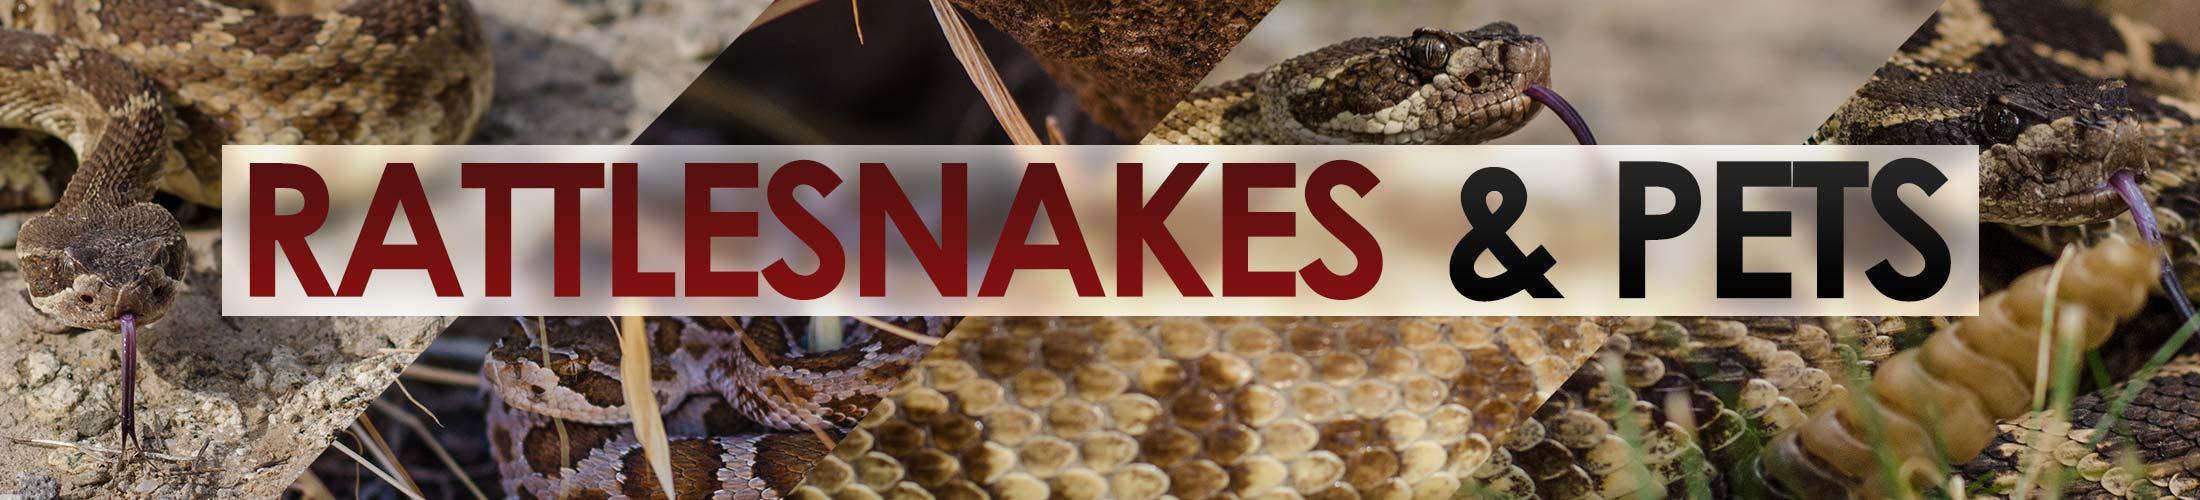 Rattlesnakes-&-Pets